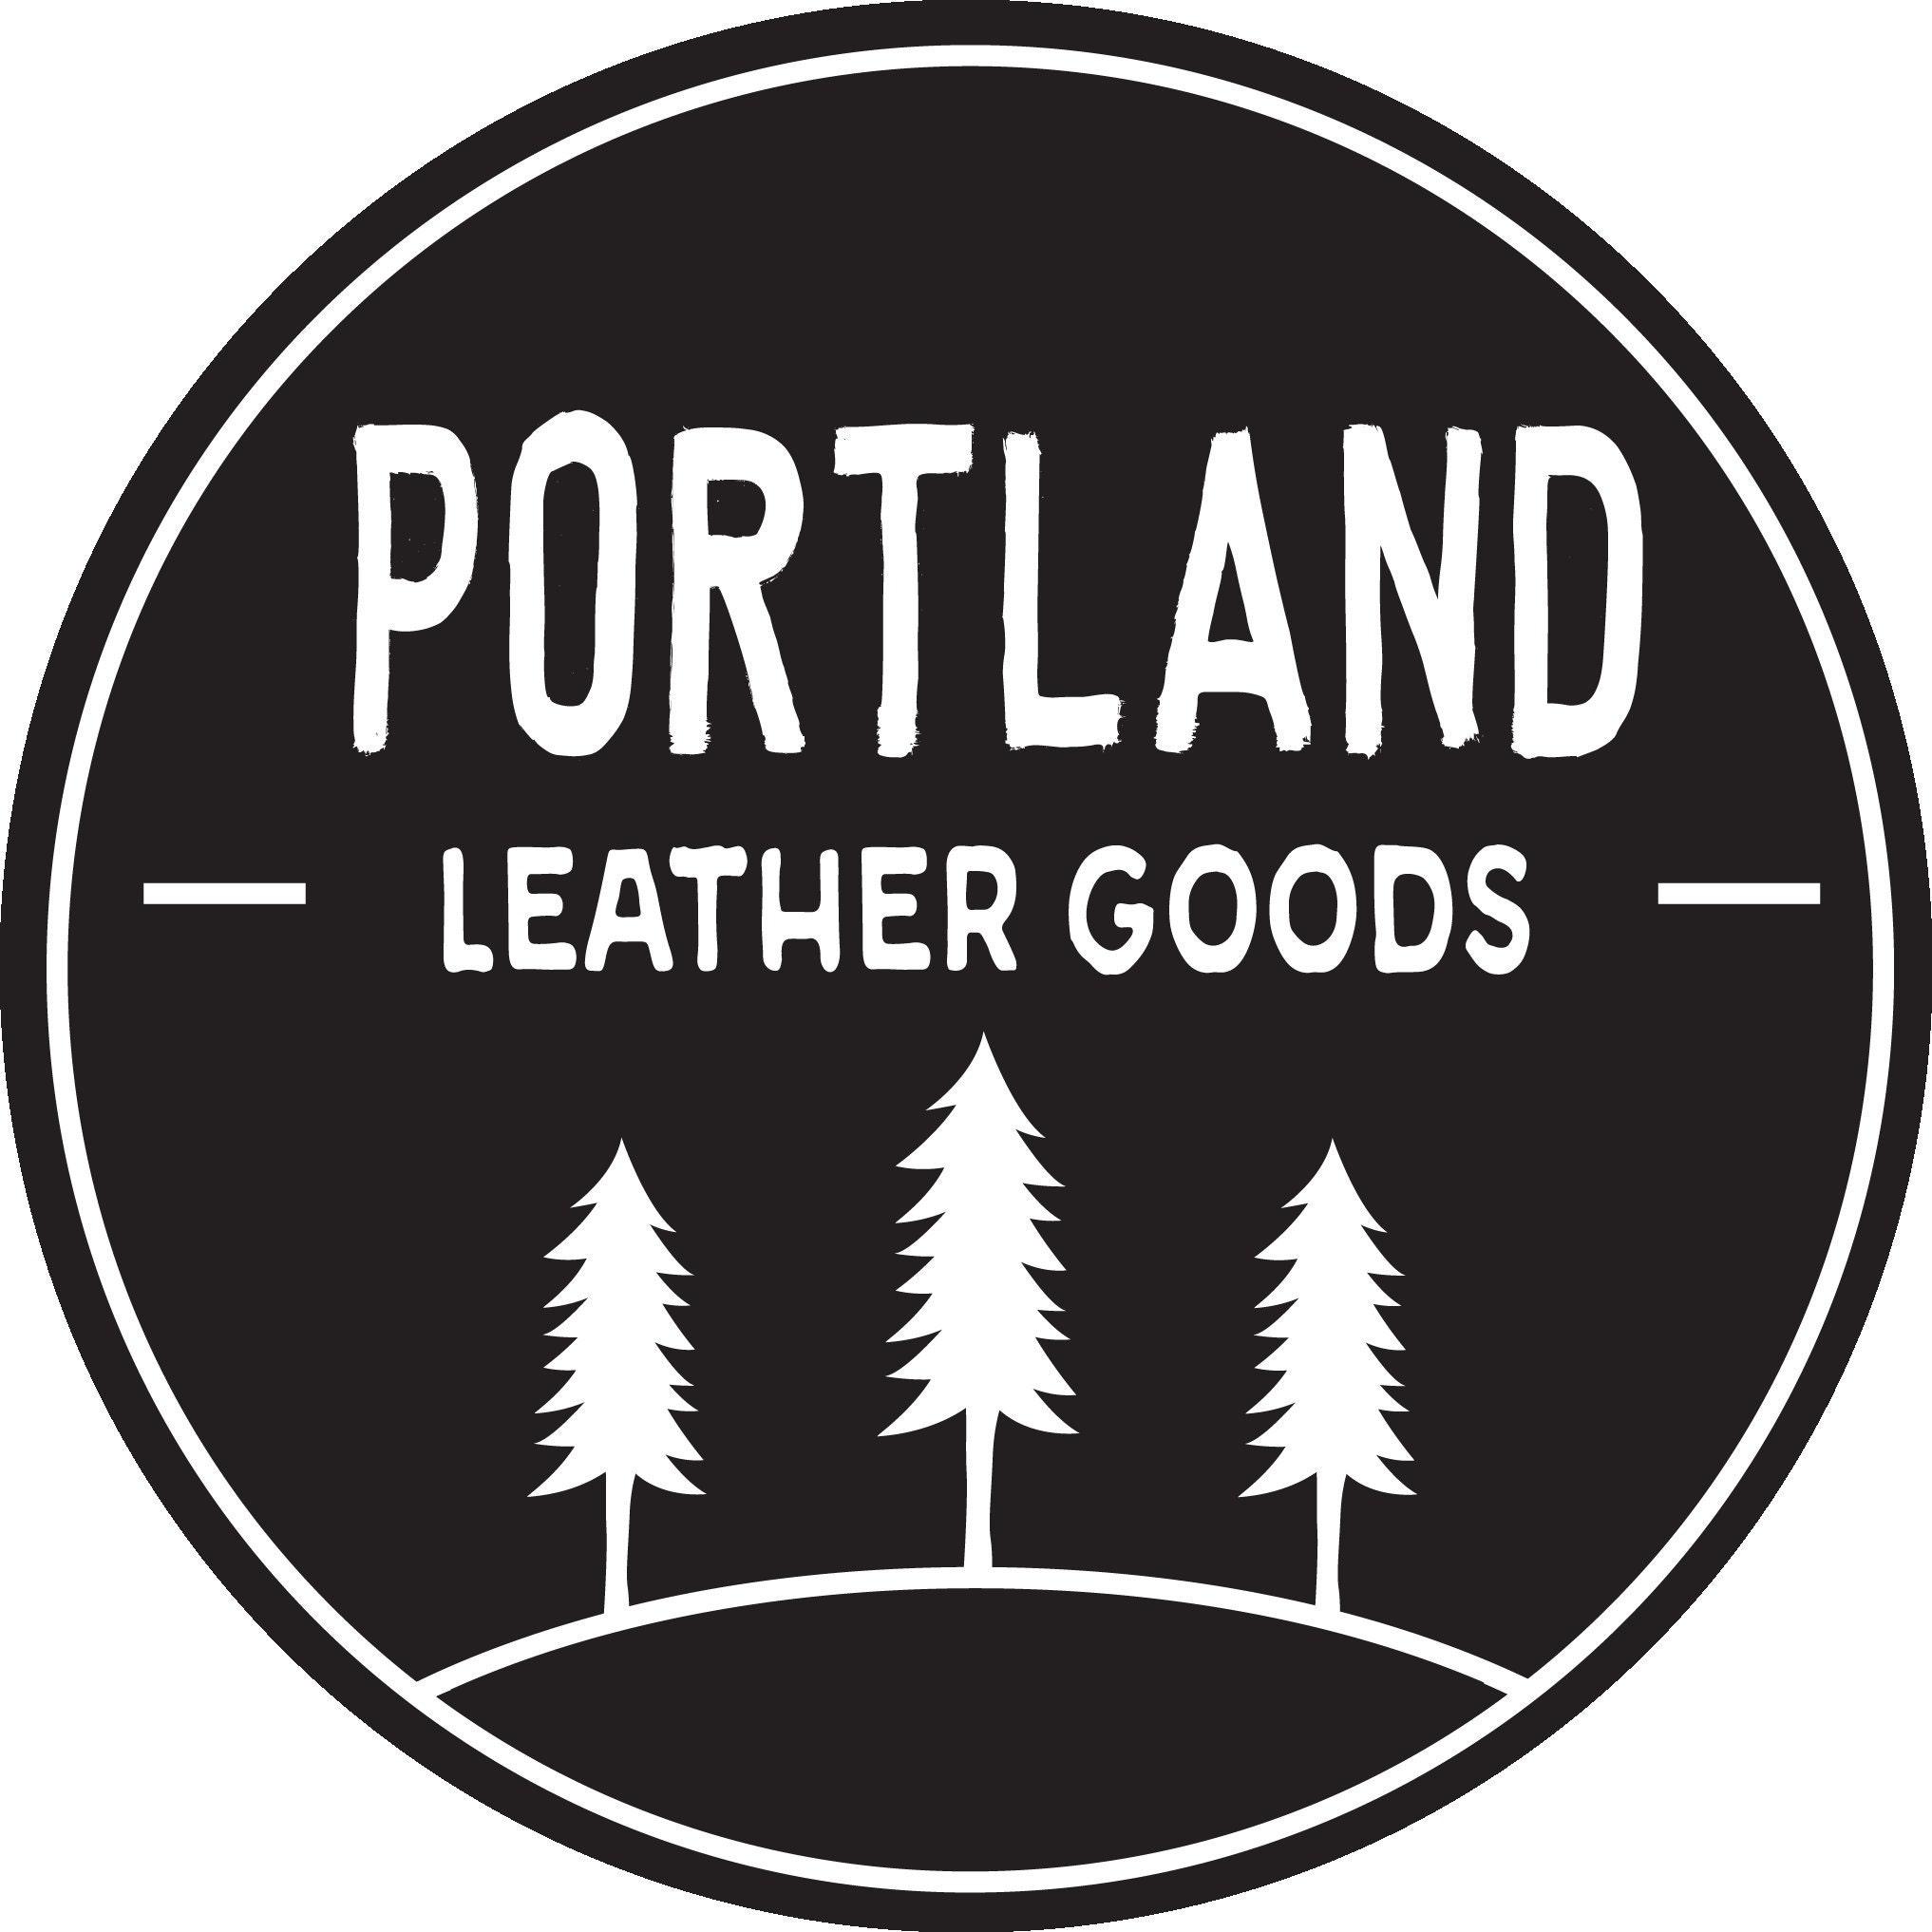 Portland Leather Goods Handmade in Oregon por PortlandLeather